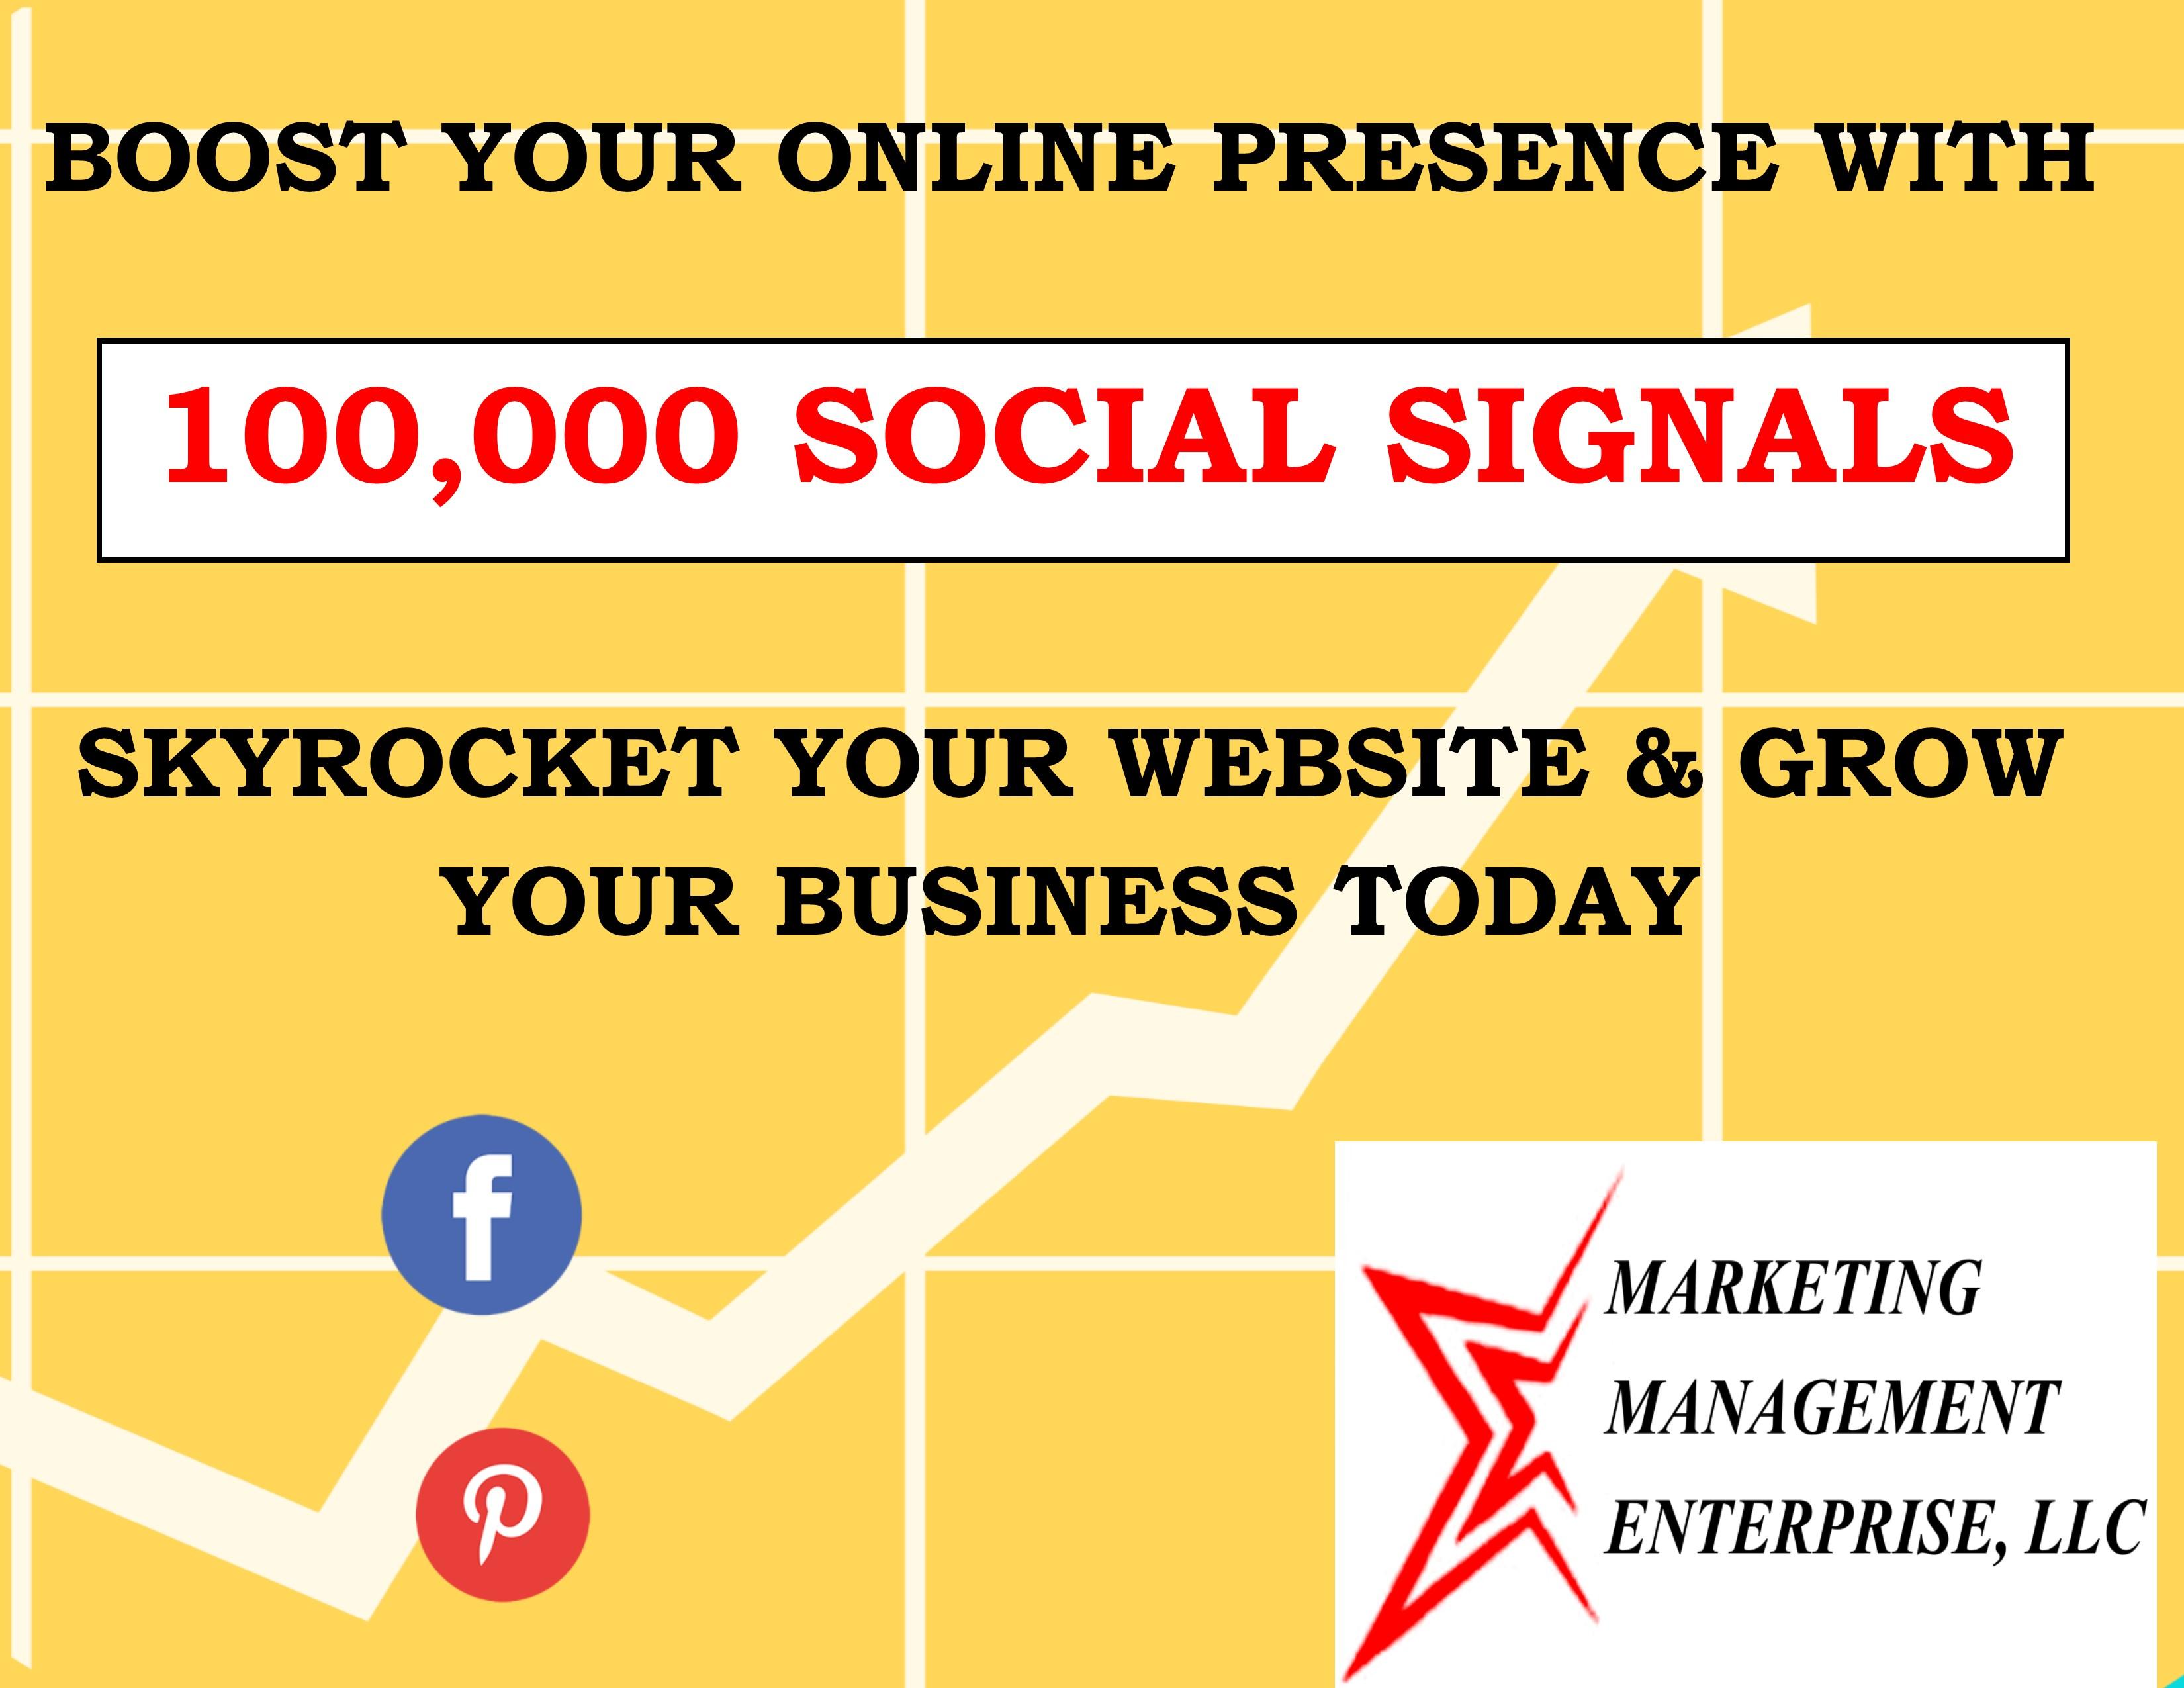 100,000 Social Signals BOOST YOUR WEBSITE